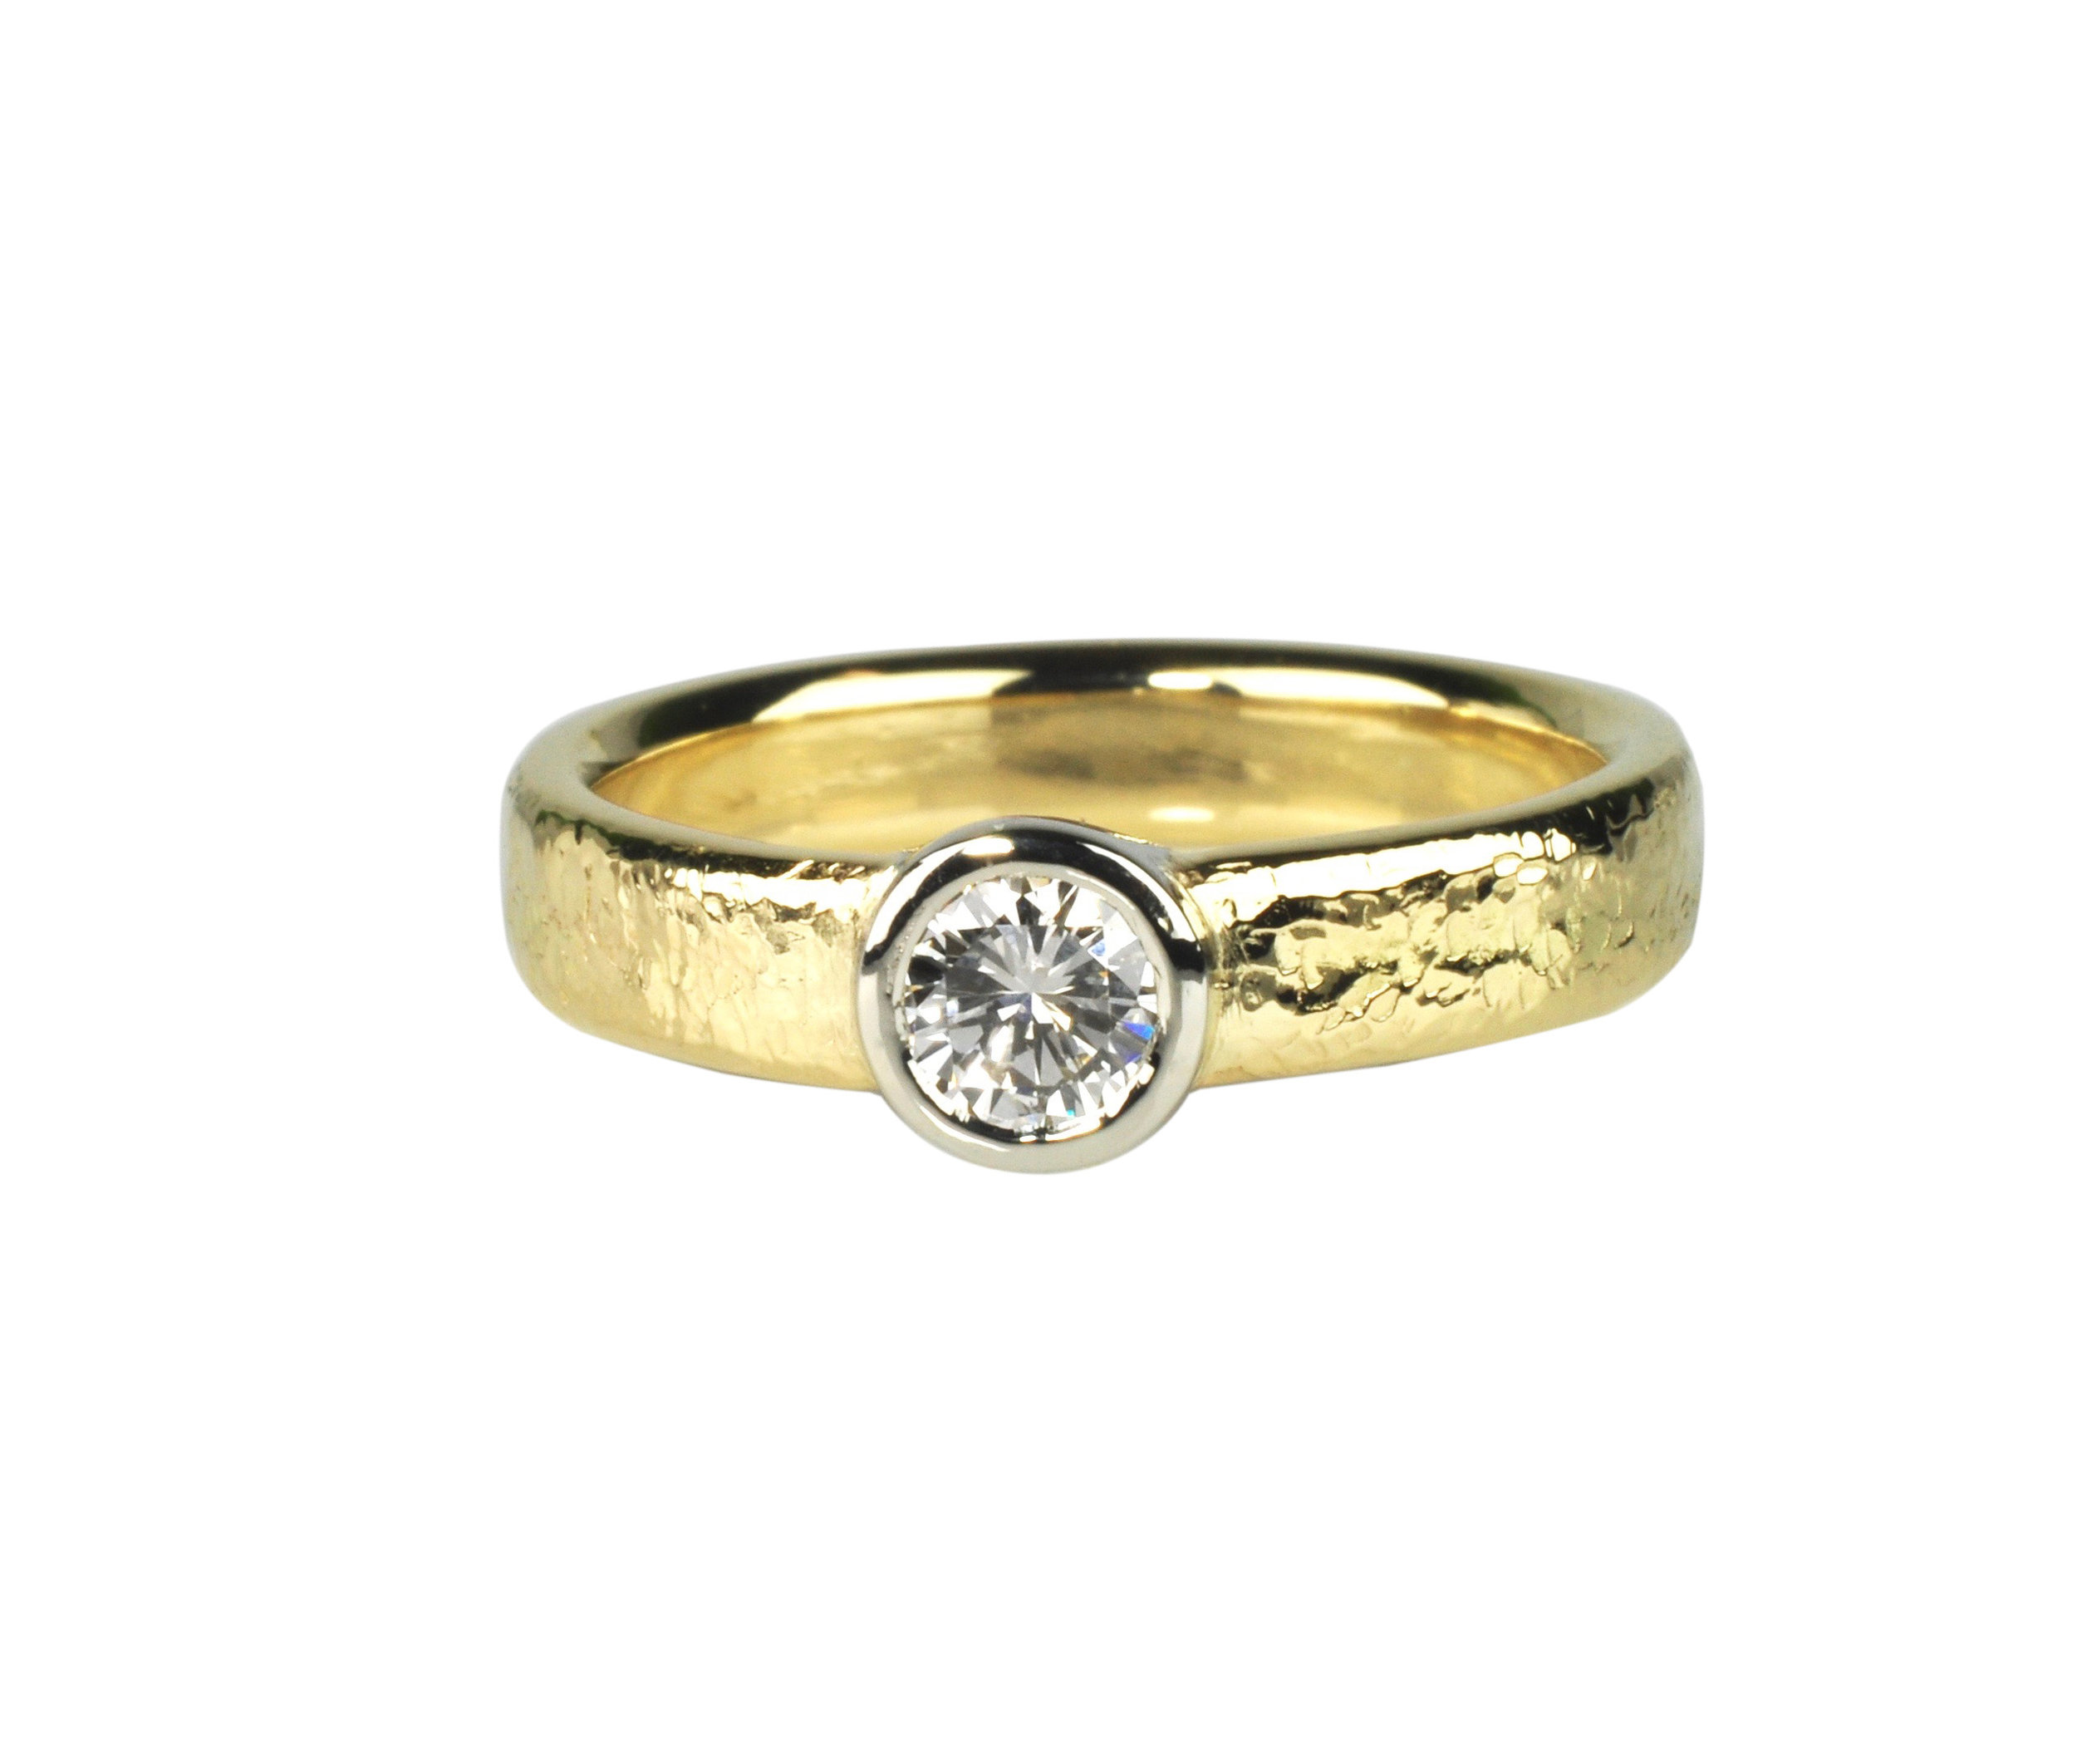 18k Gold and 14k White Gold Diamond Ring